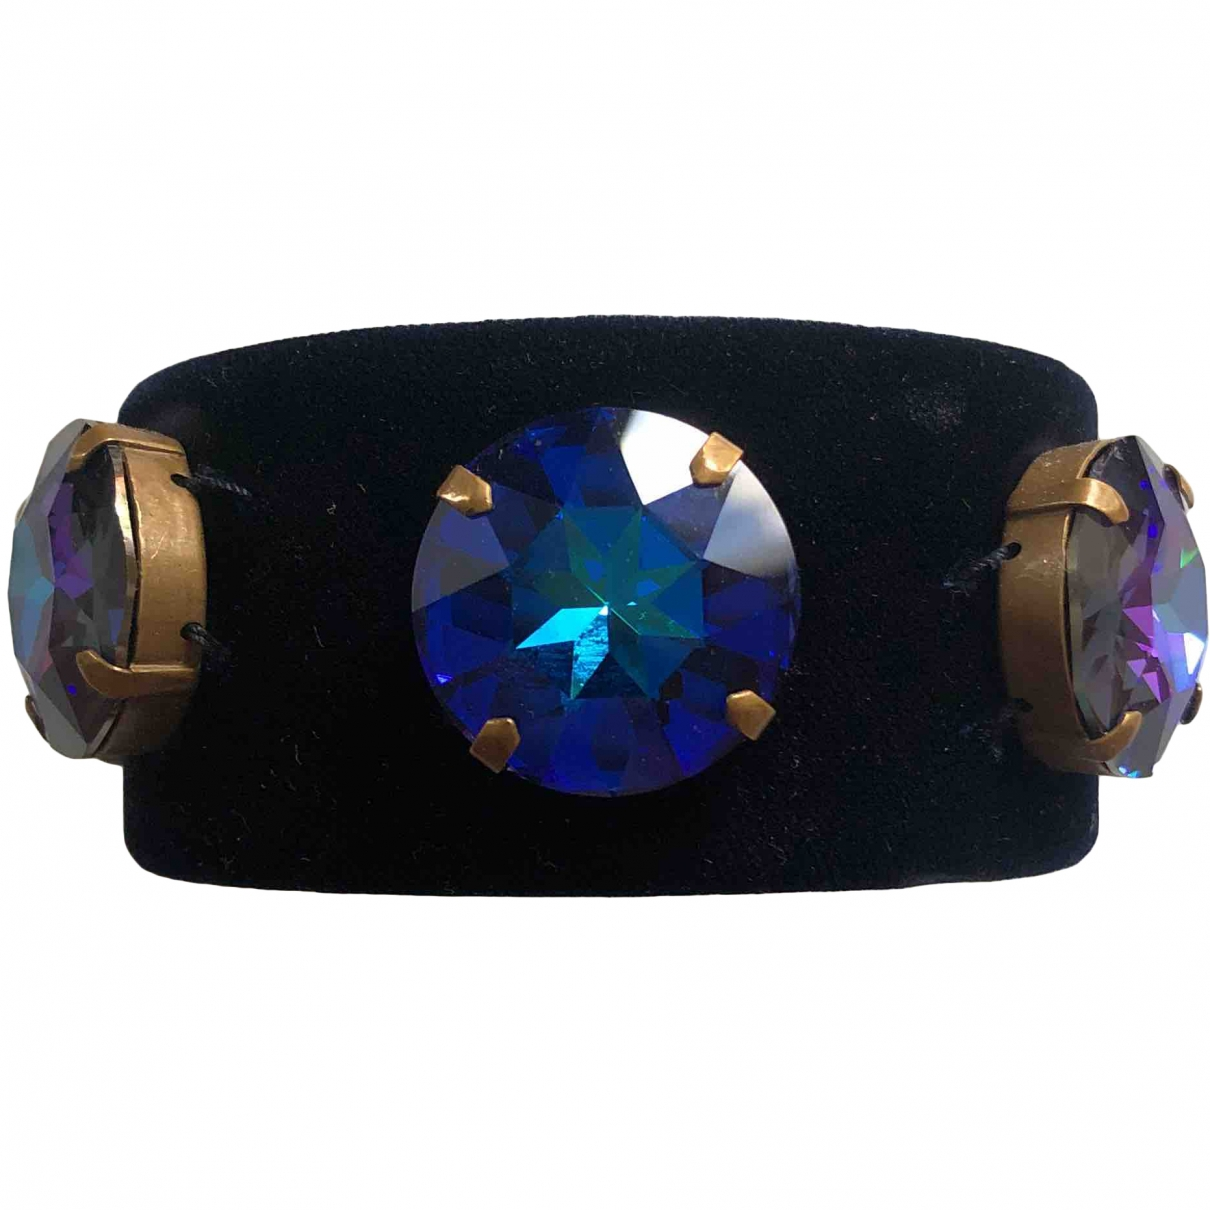 Miu Miu \N Armband in  Blau Leinen